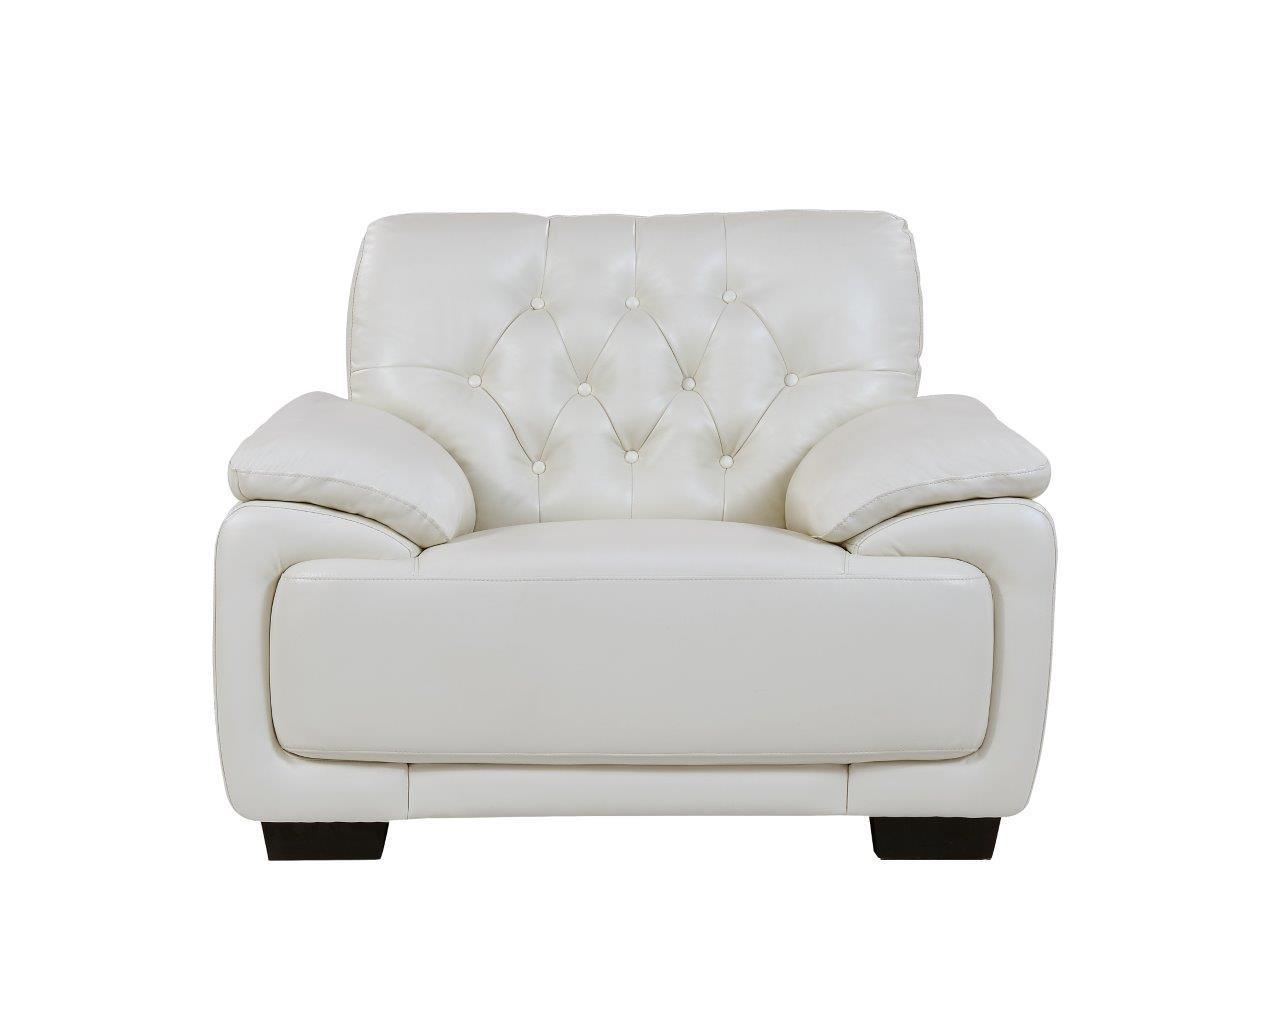 Remarkable U1066 Pluto White Leather Chair By Global Furniture Inzonedesignstudio Interior Chair Design Inzonedesignstudiocom